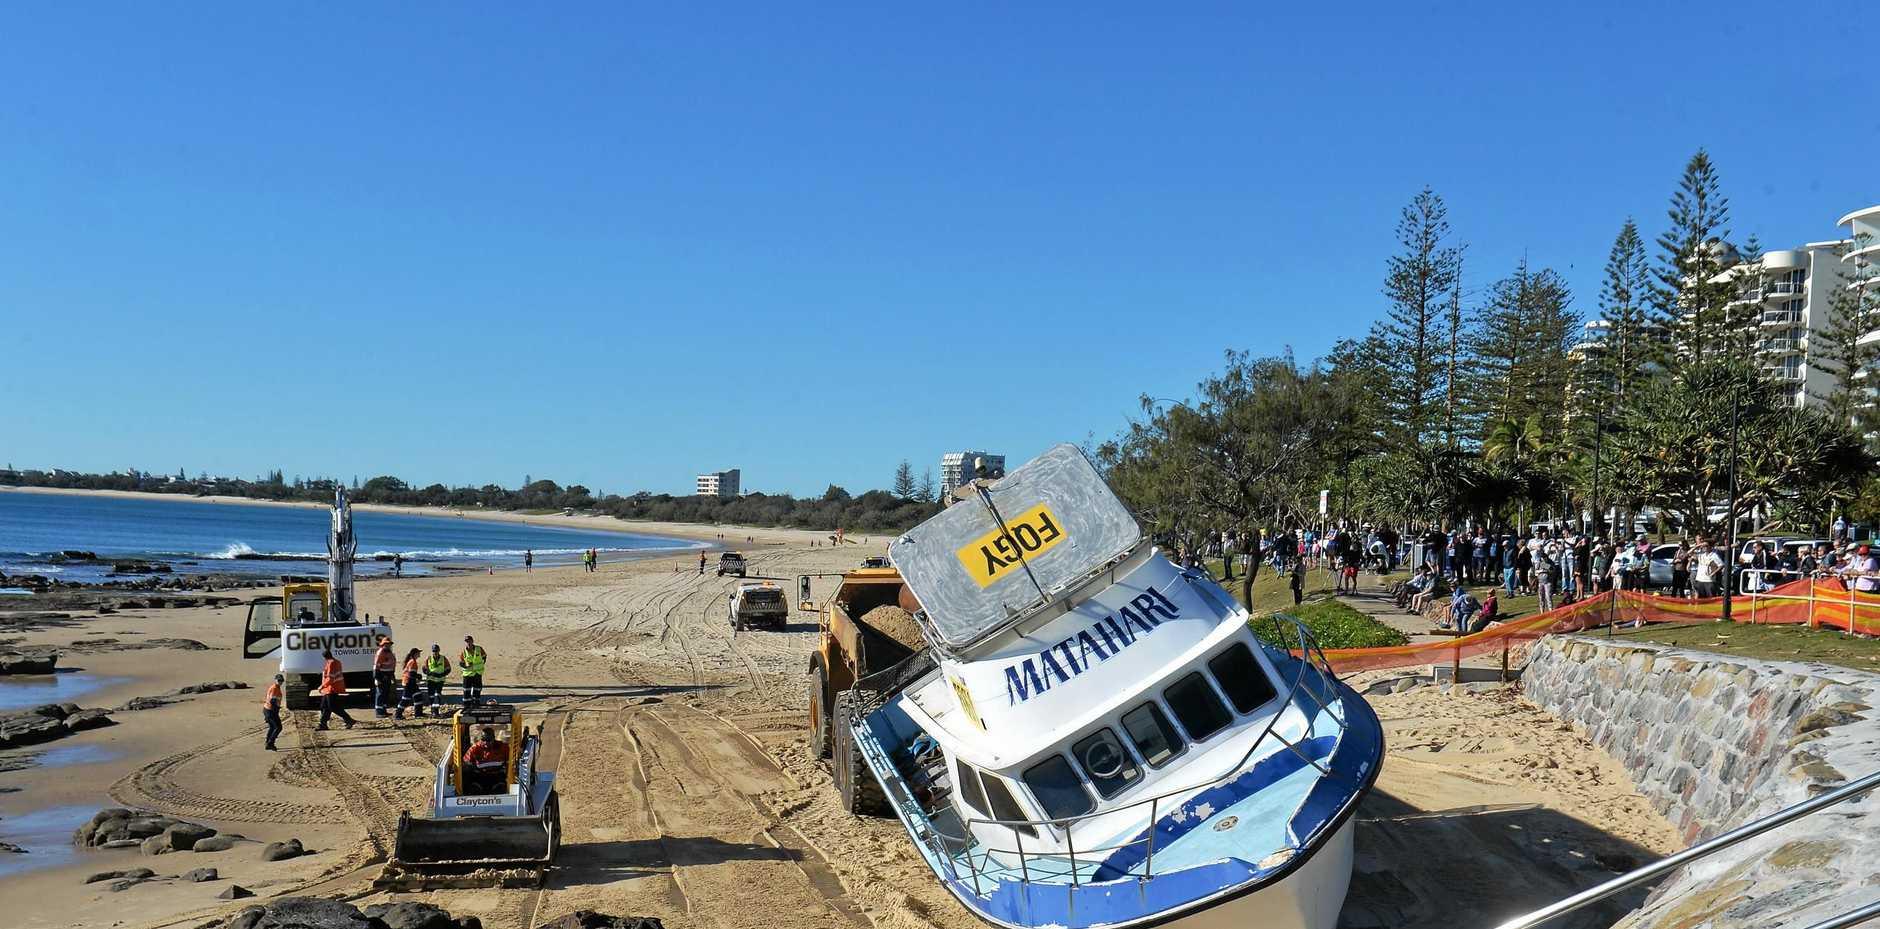 The Matahari being towed along Mooloolaba Beach.